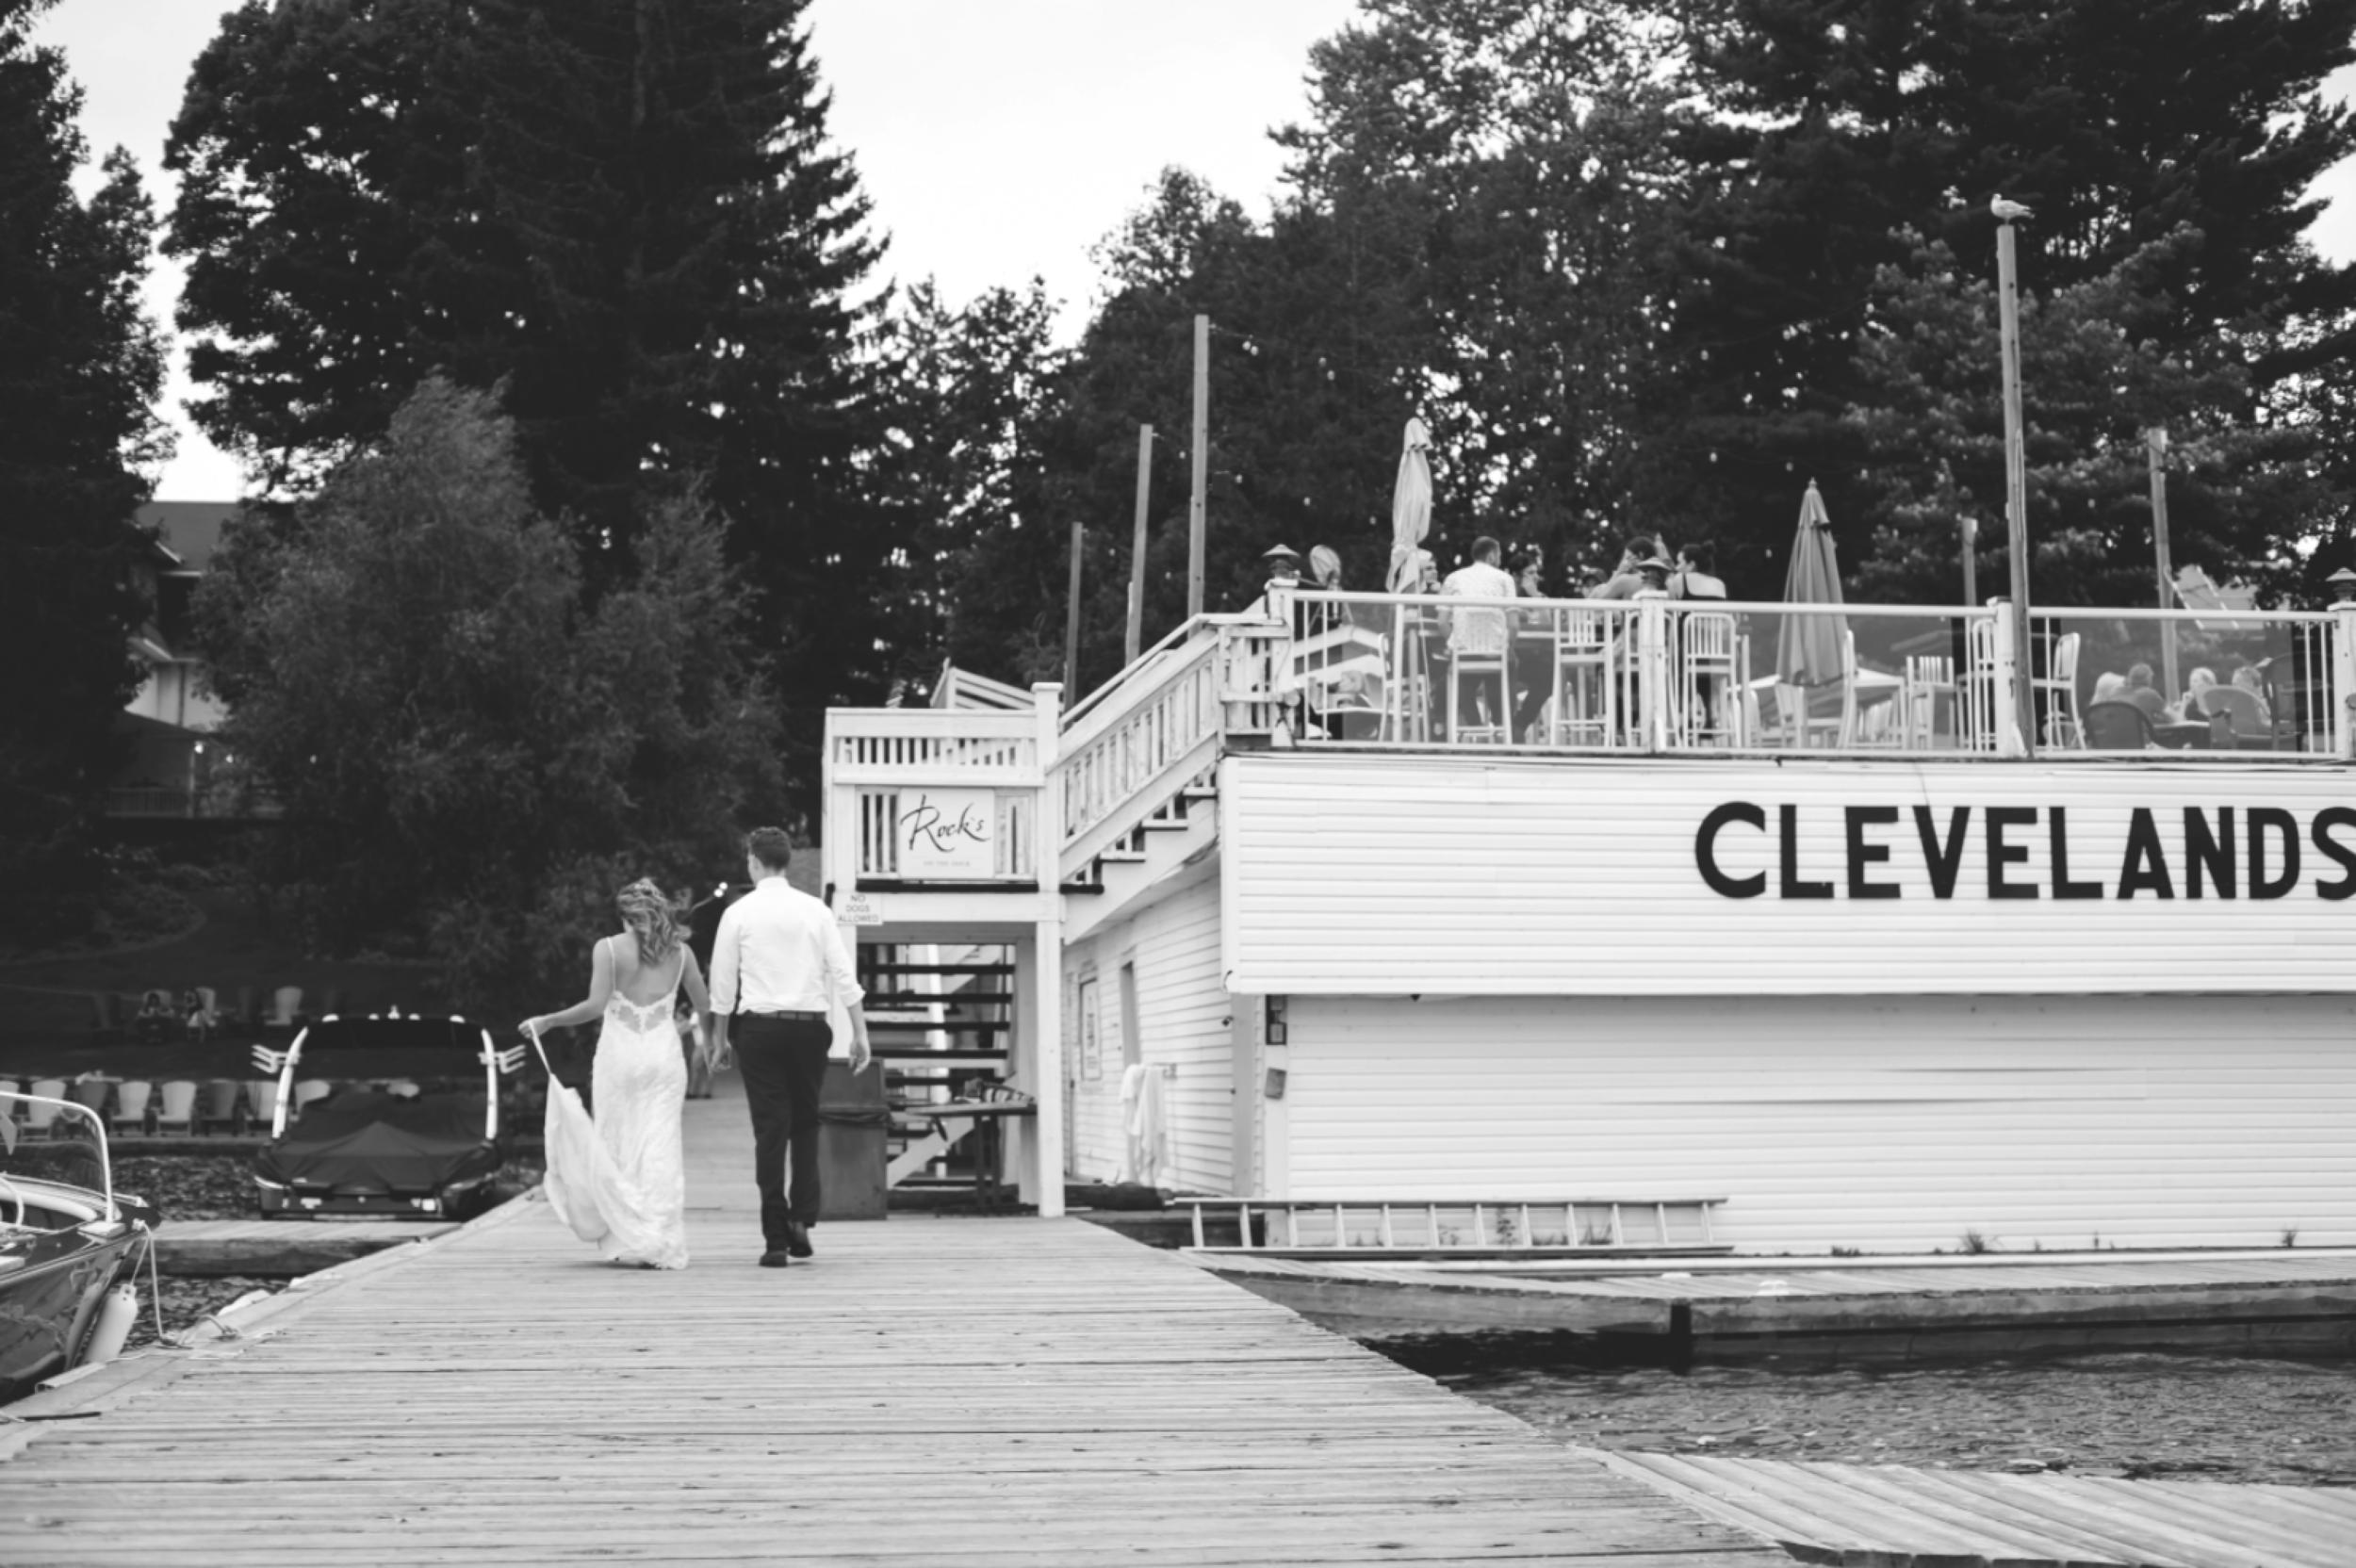 Wedding-Photos-Muskoka-Clevelands-House-Photographer-Wedding-Hamilton-GTA-Niagara-Oakville-Moments-by-Lauren-Photography-Photo-Image-101.png